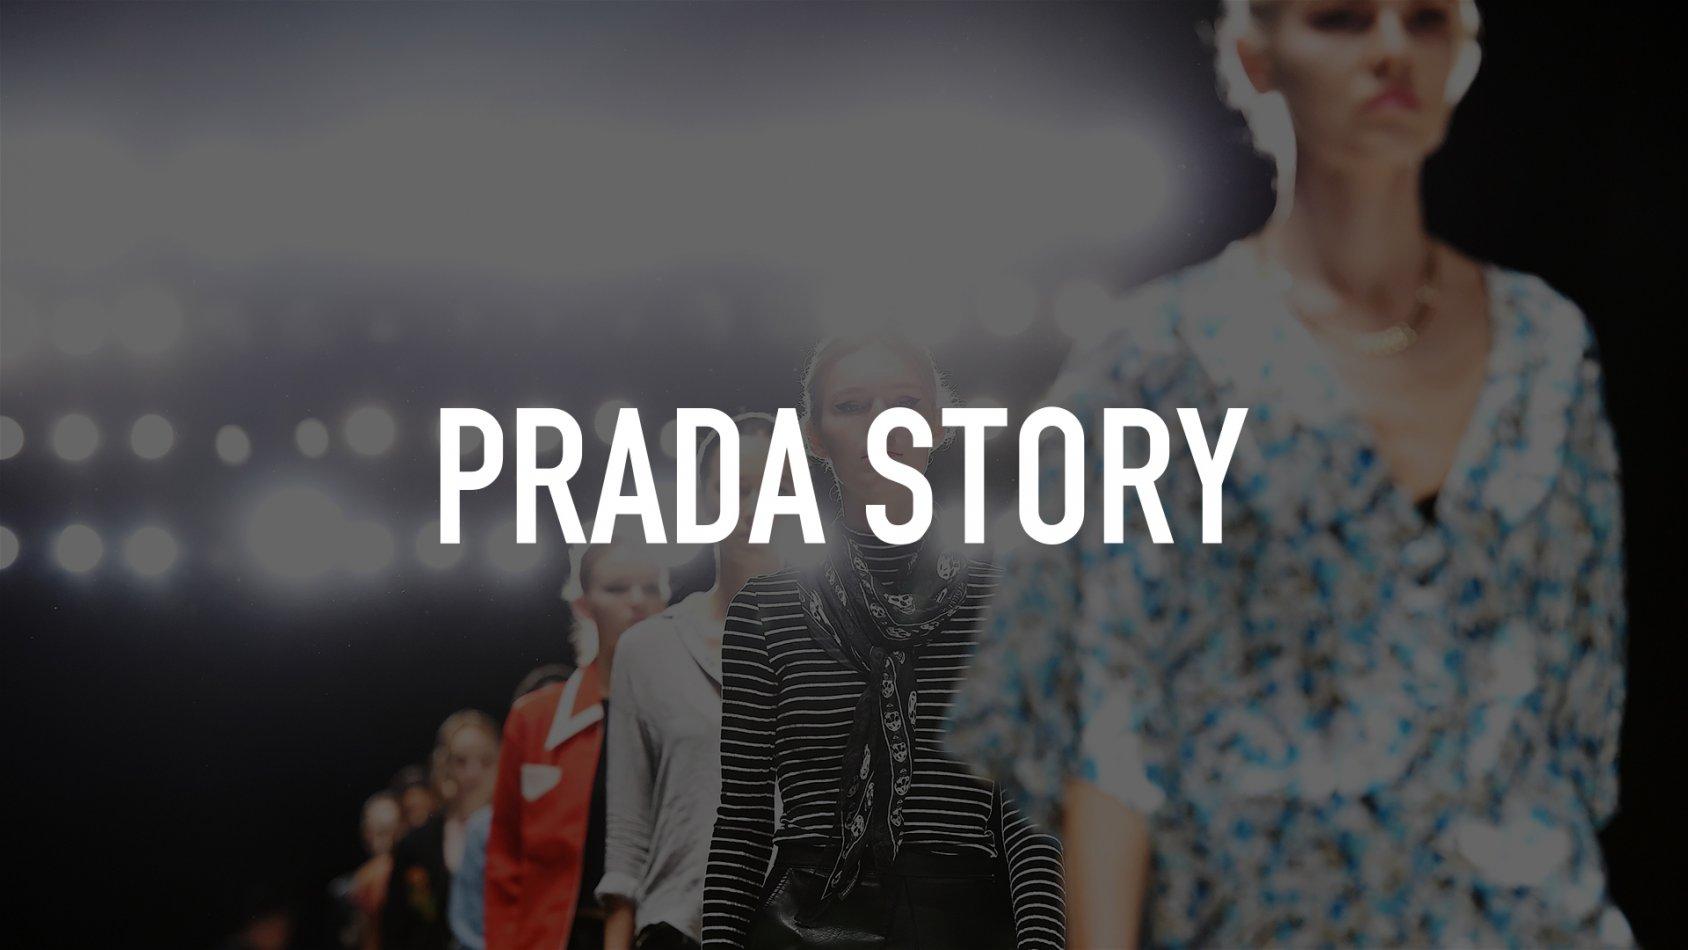 Prada Story